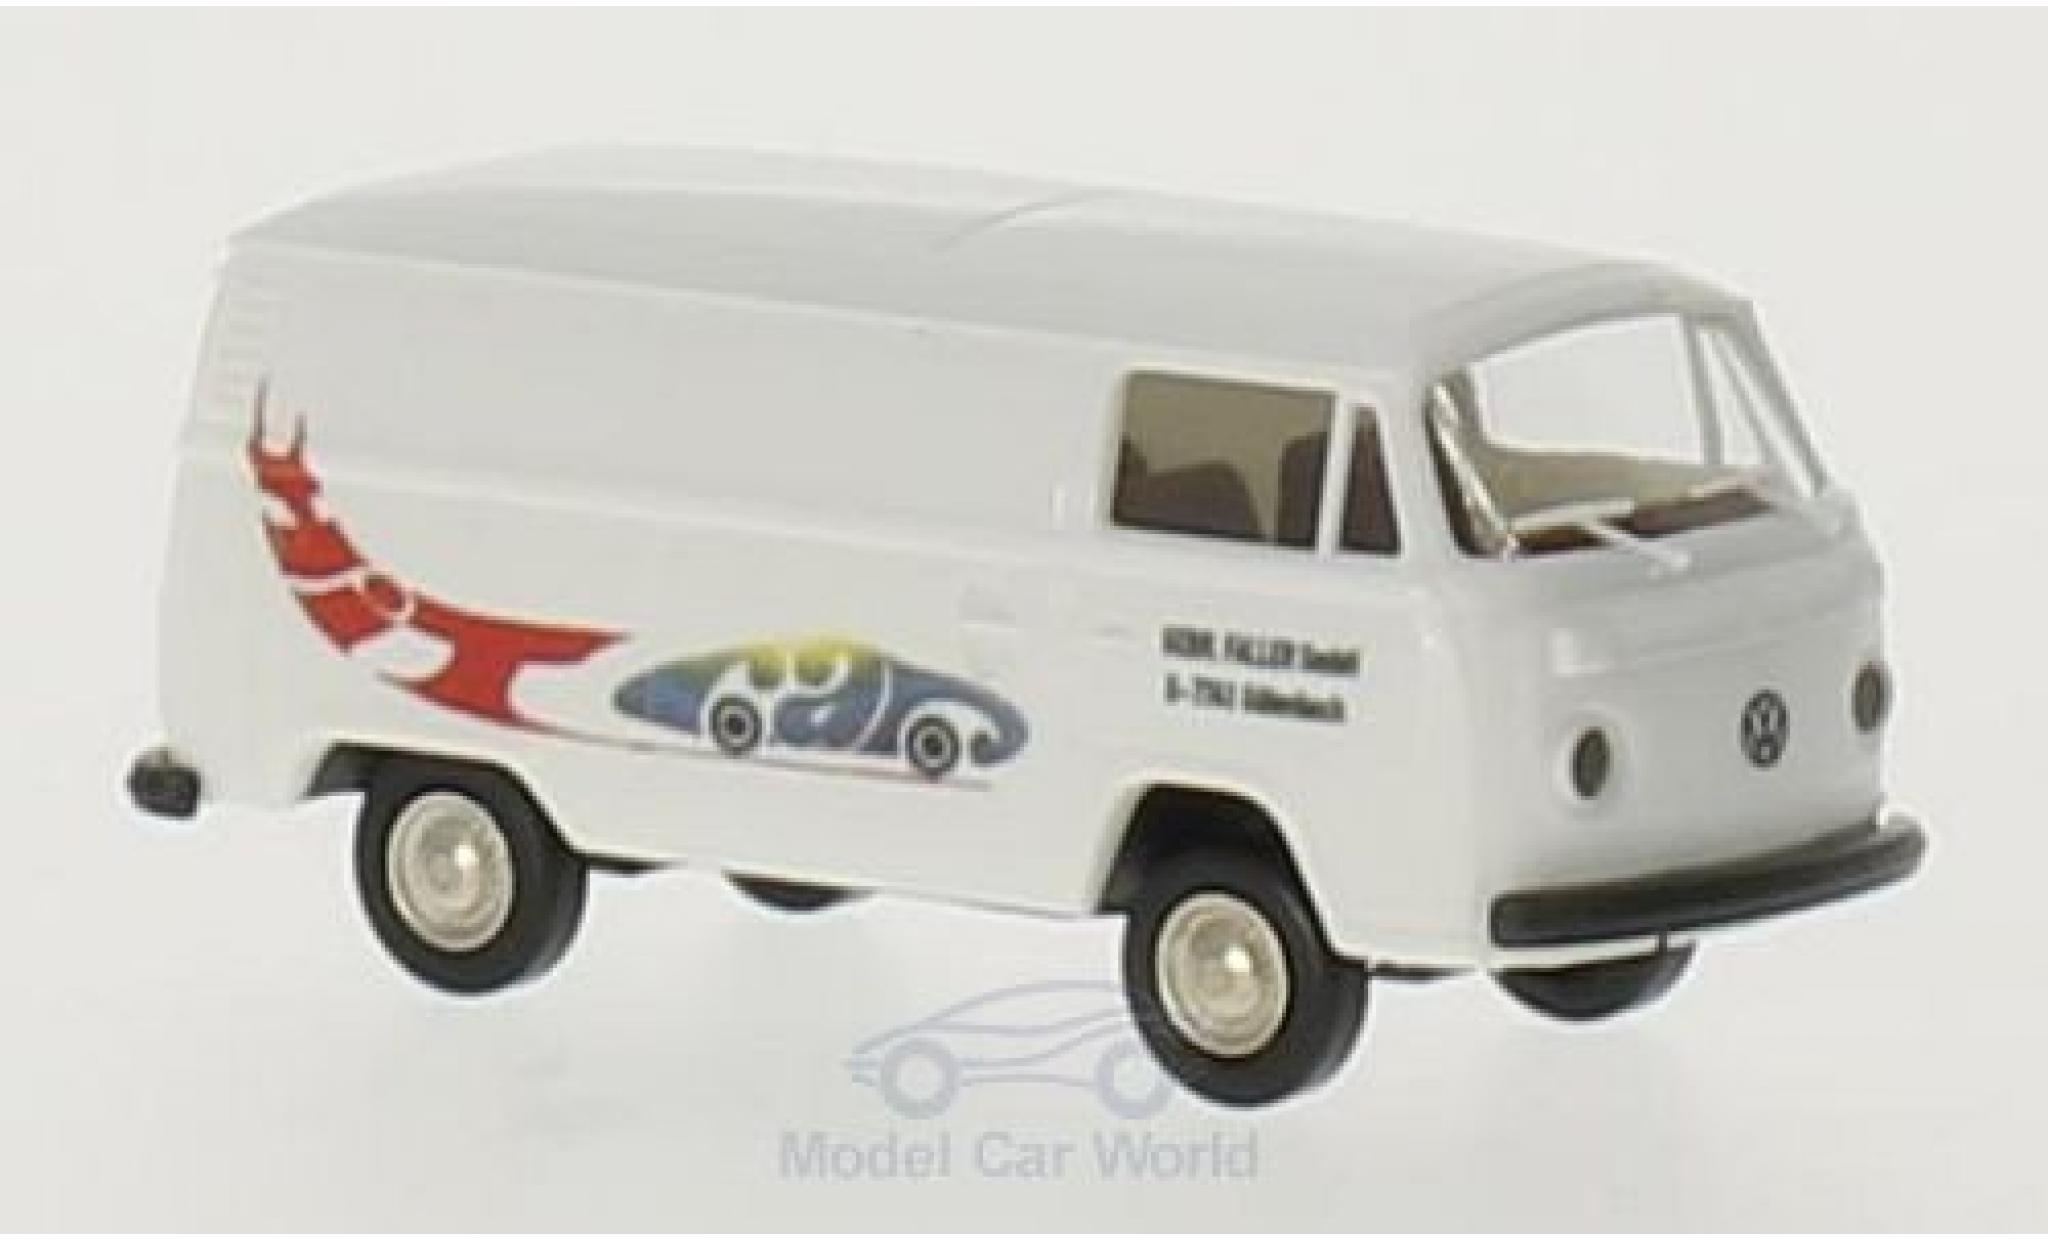 Volkswagen T2 1/87 Brekina Kasten Faller Hitcar 70 Jahre Faller